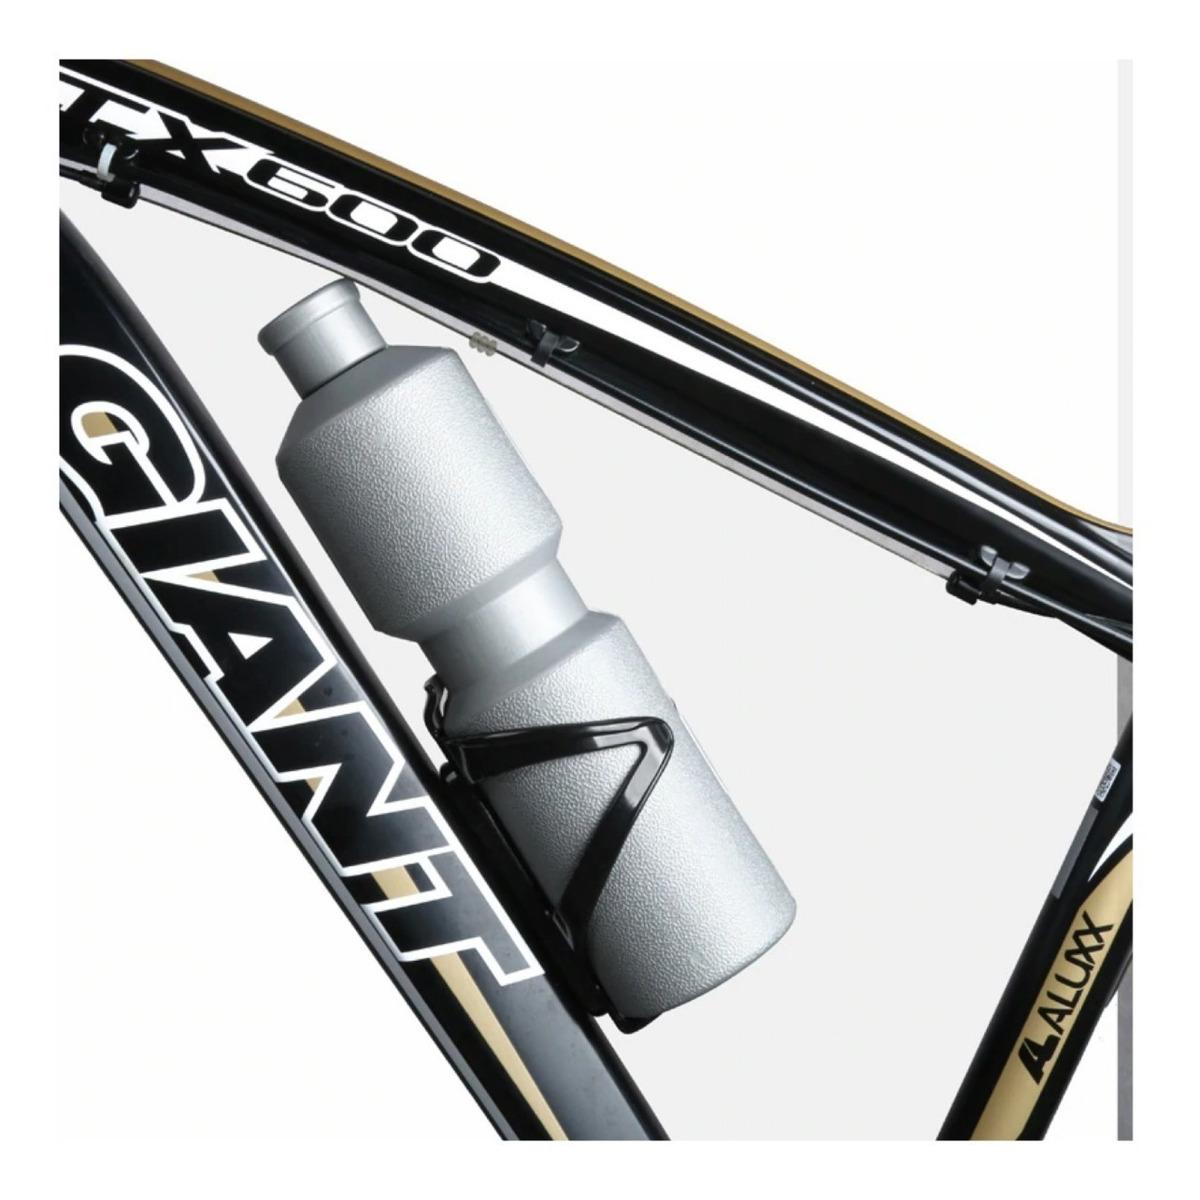 b91886f8a48 botella kit porta herramienta bicicleta parche bici anfora. Cargando zoom.